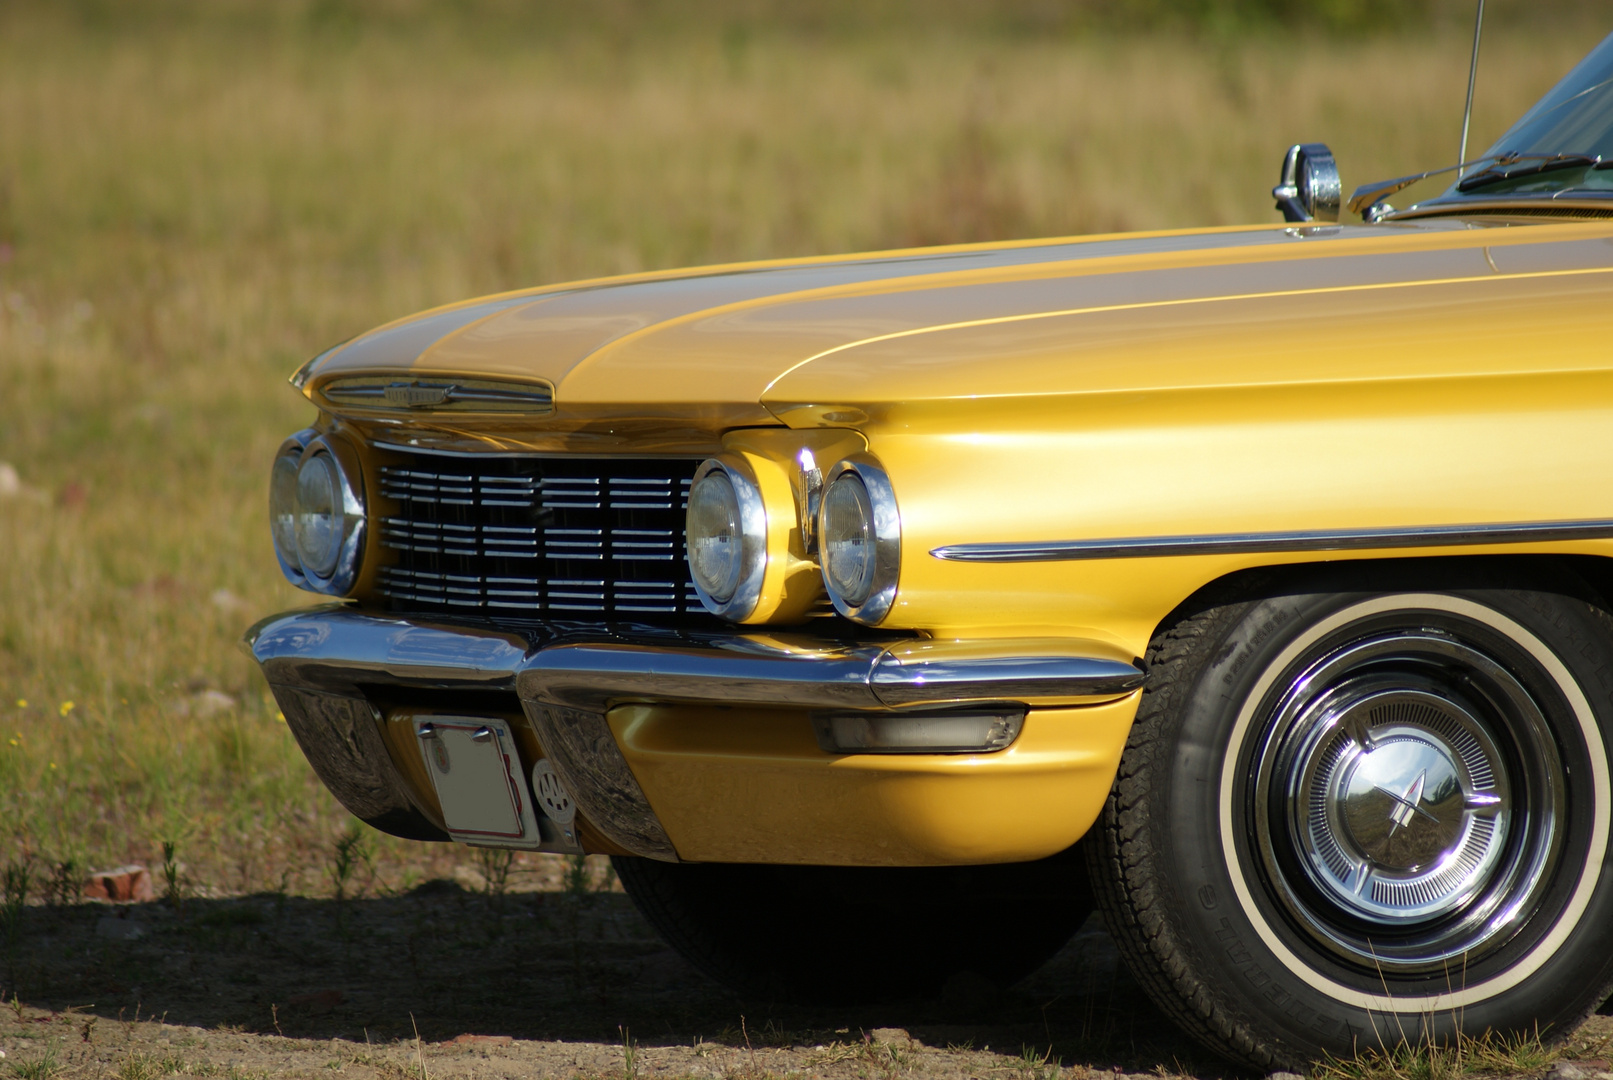 ...1960 Oldsmobile-Front...